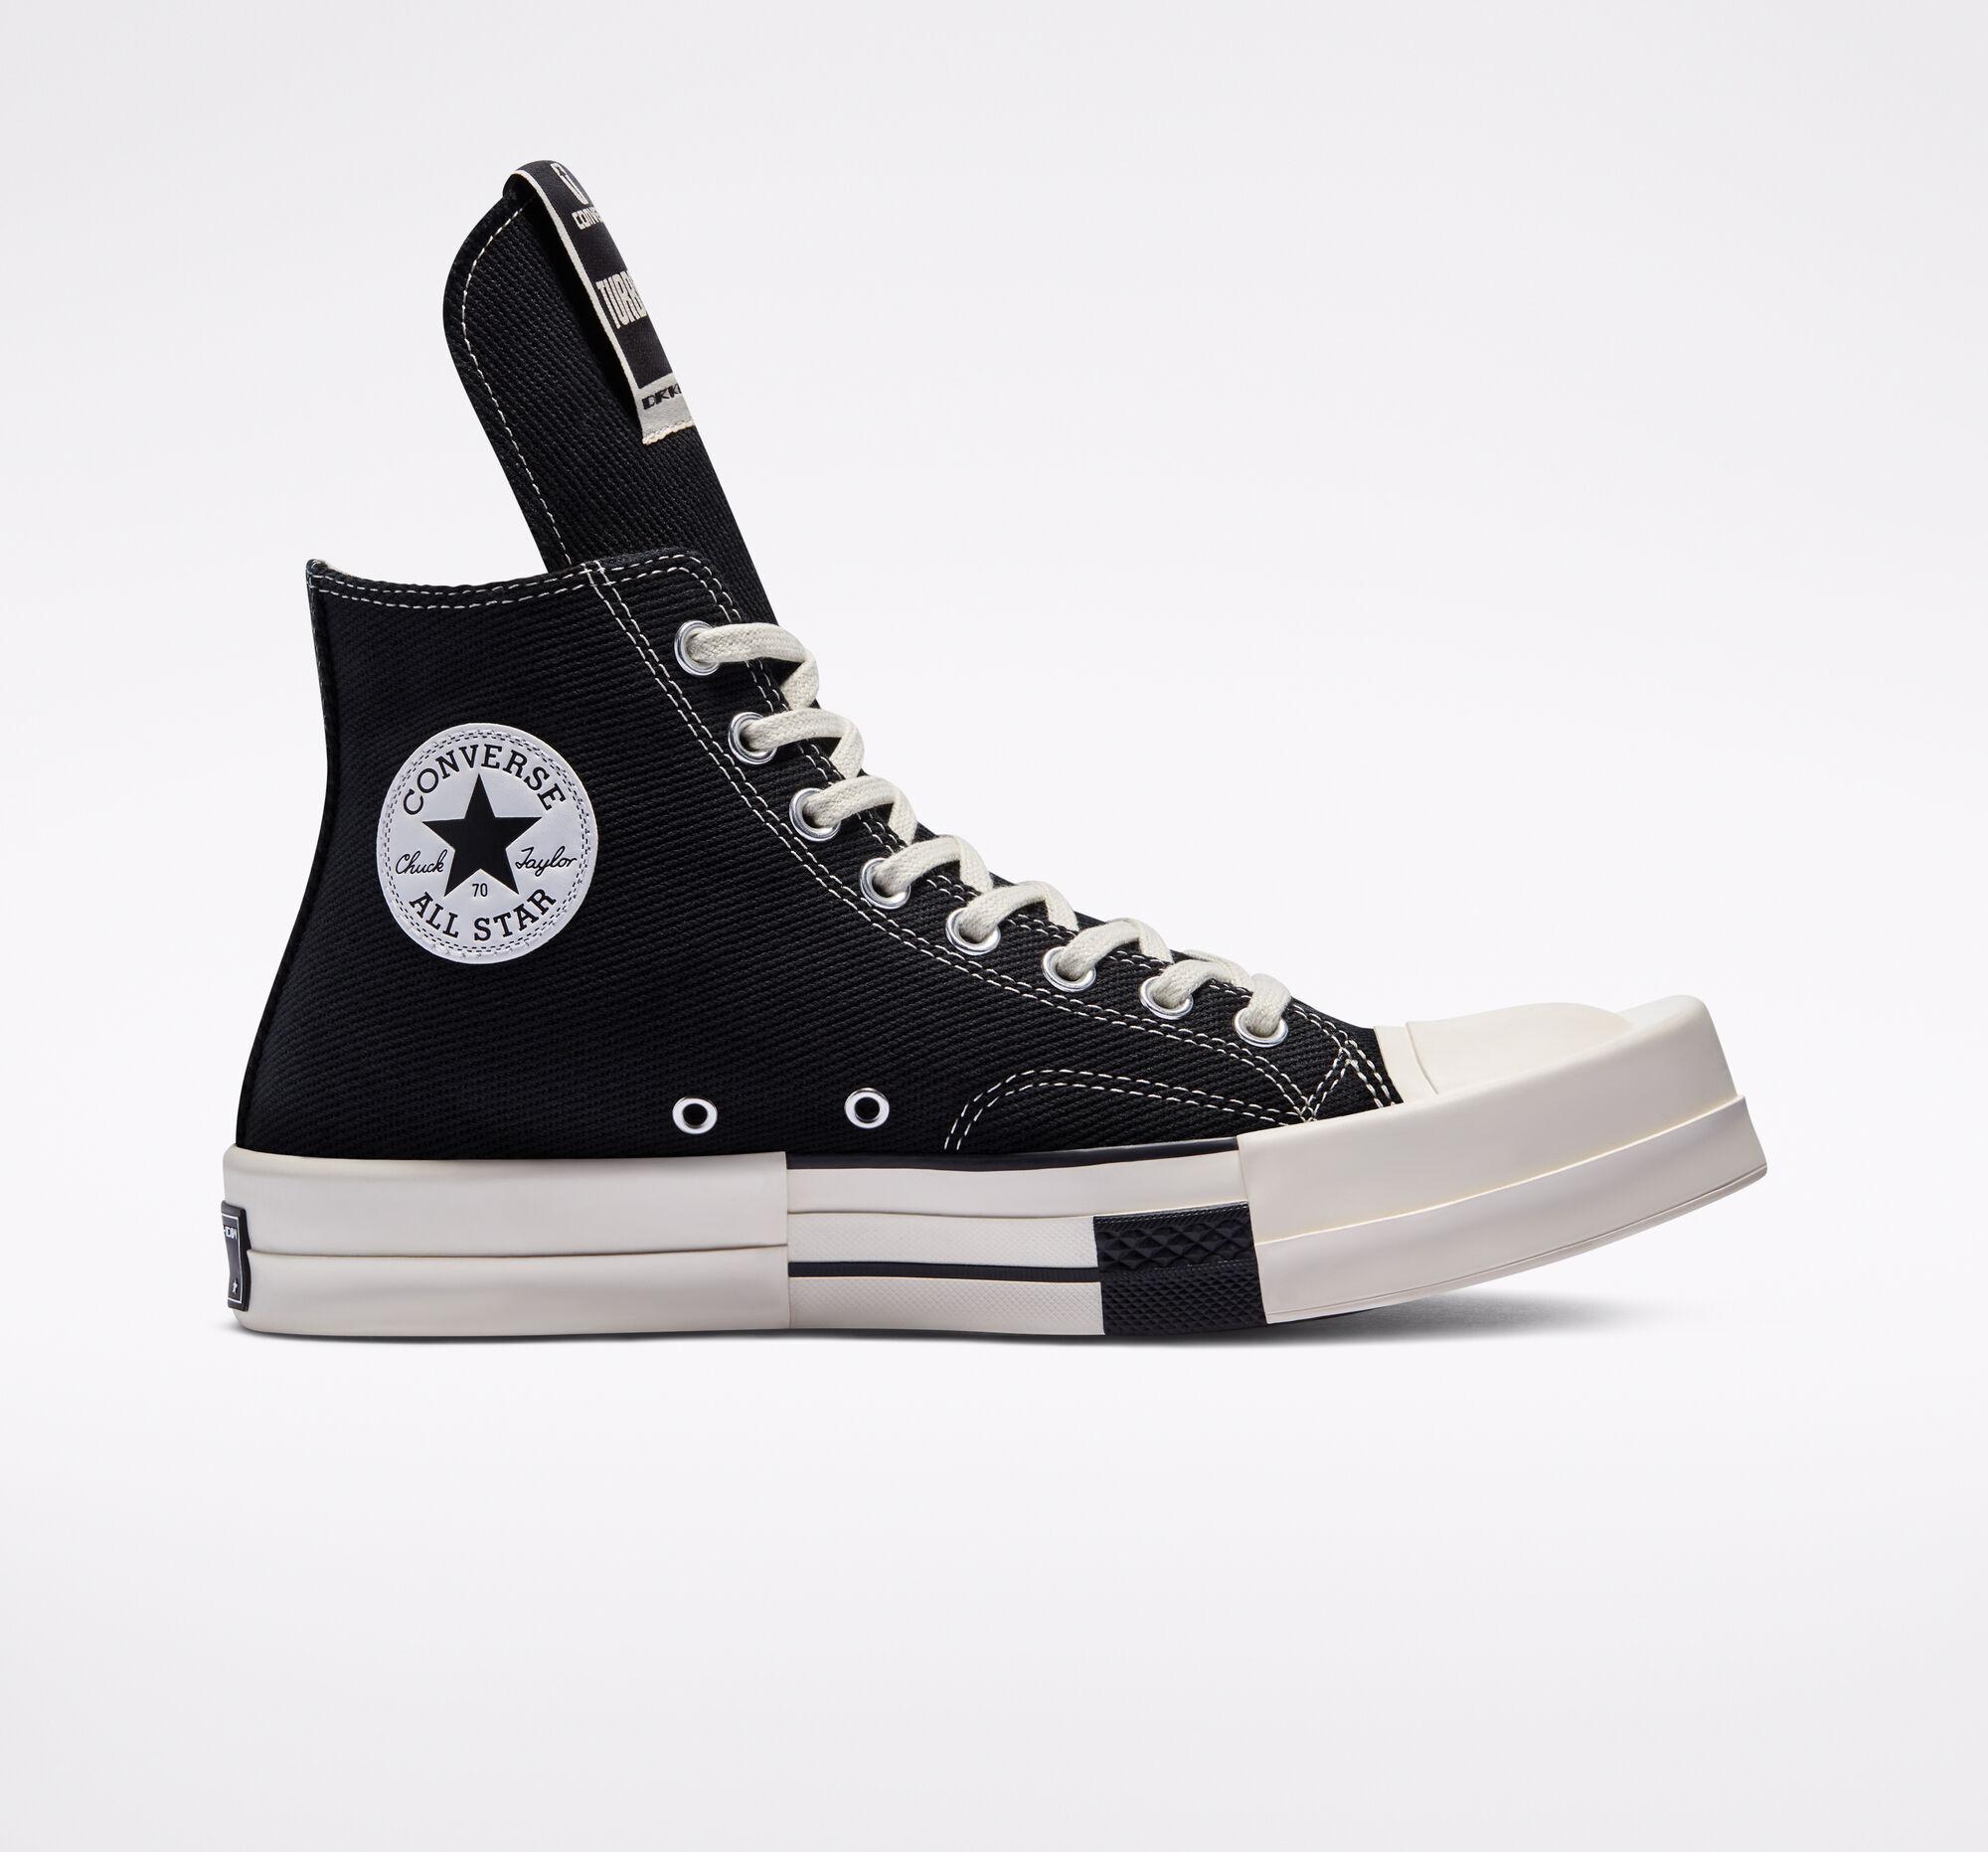 Converse x Rick Owens DRKSHDW 暗黑教父 TURBODRK Chuck 70 高帮 小码全